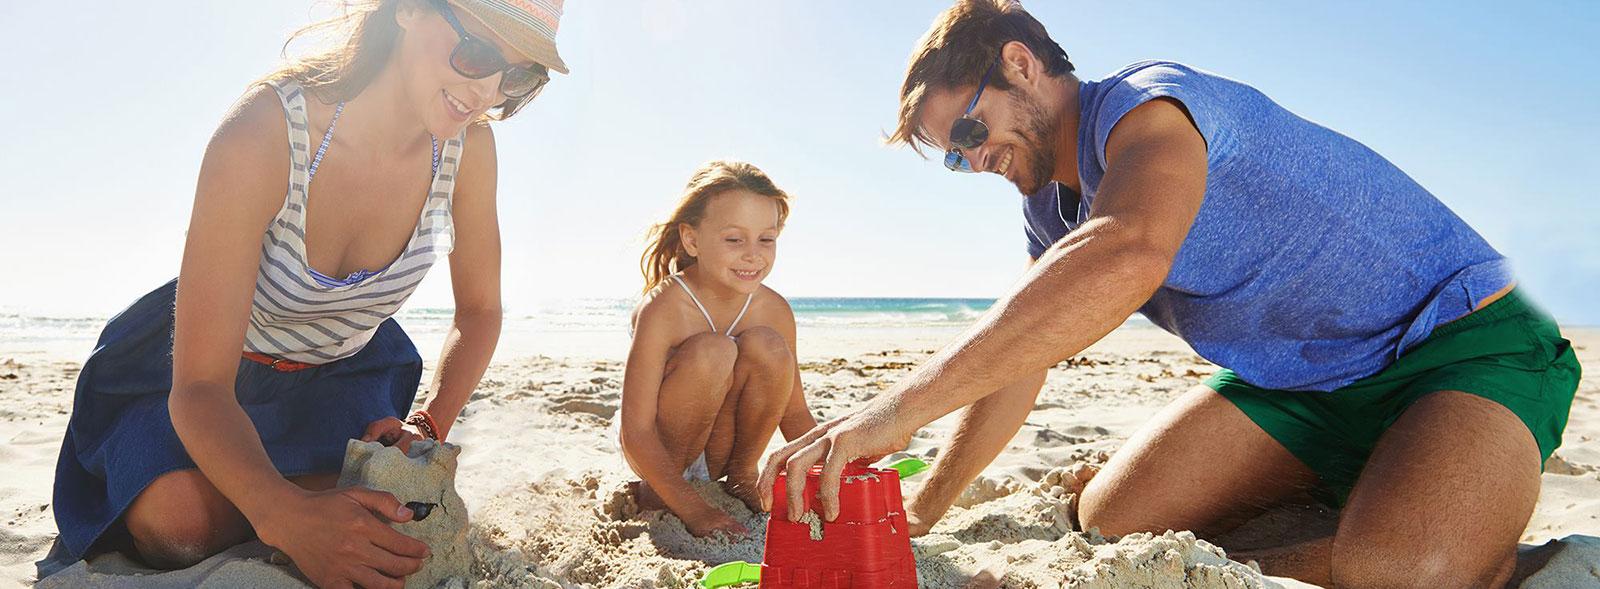 A family of three building sand castles at La Jolla Shores beach